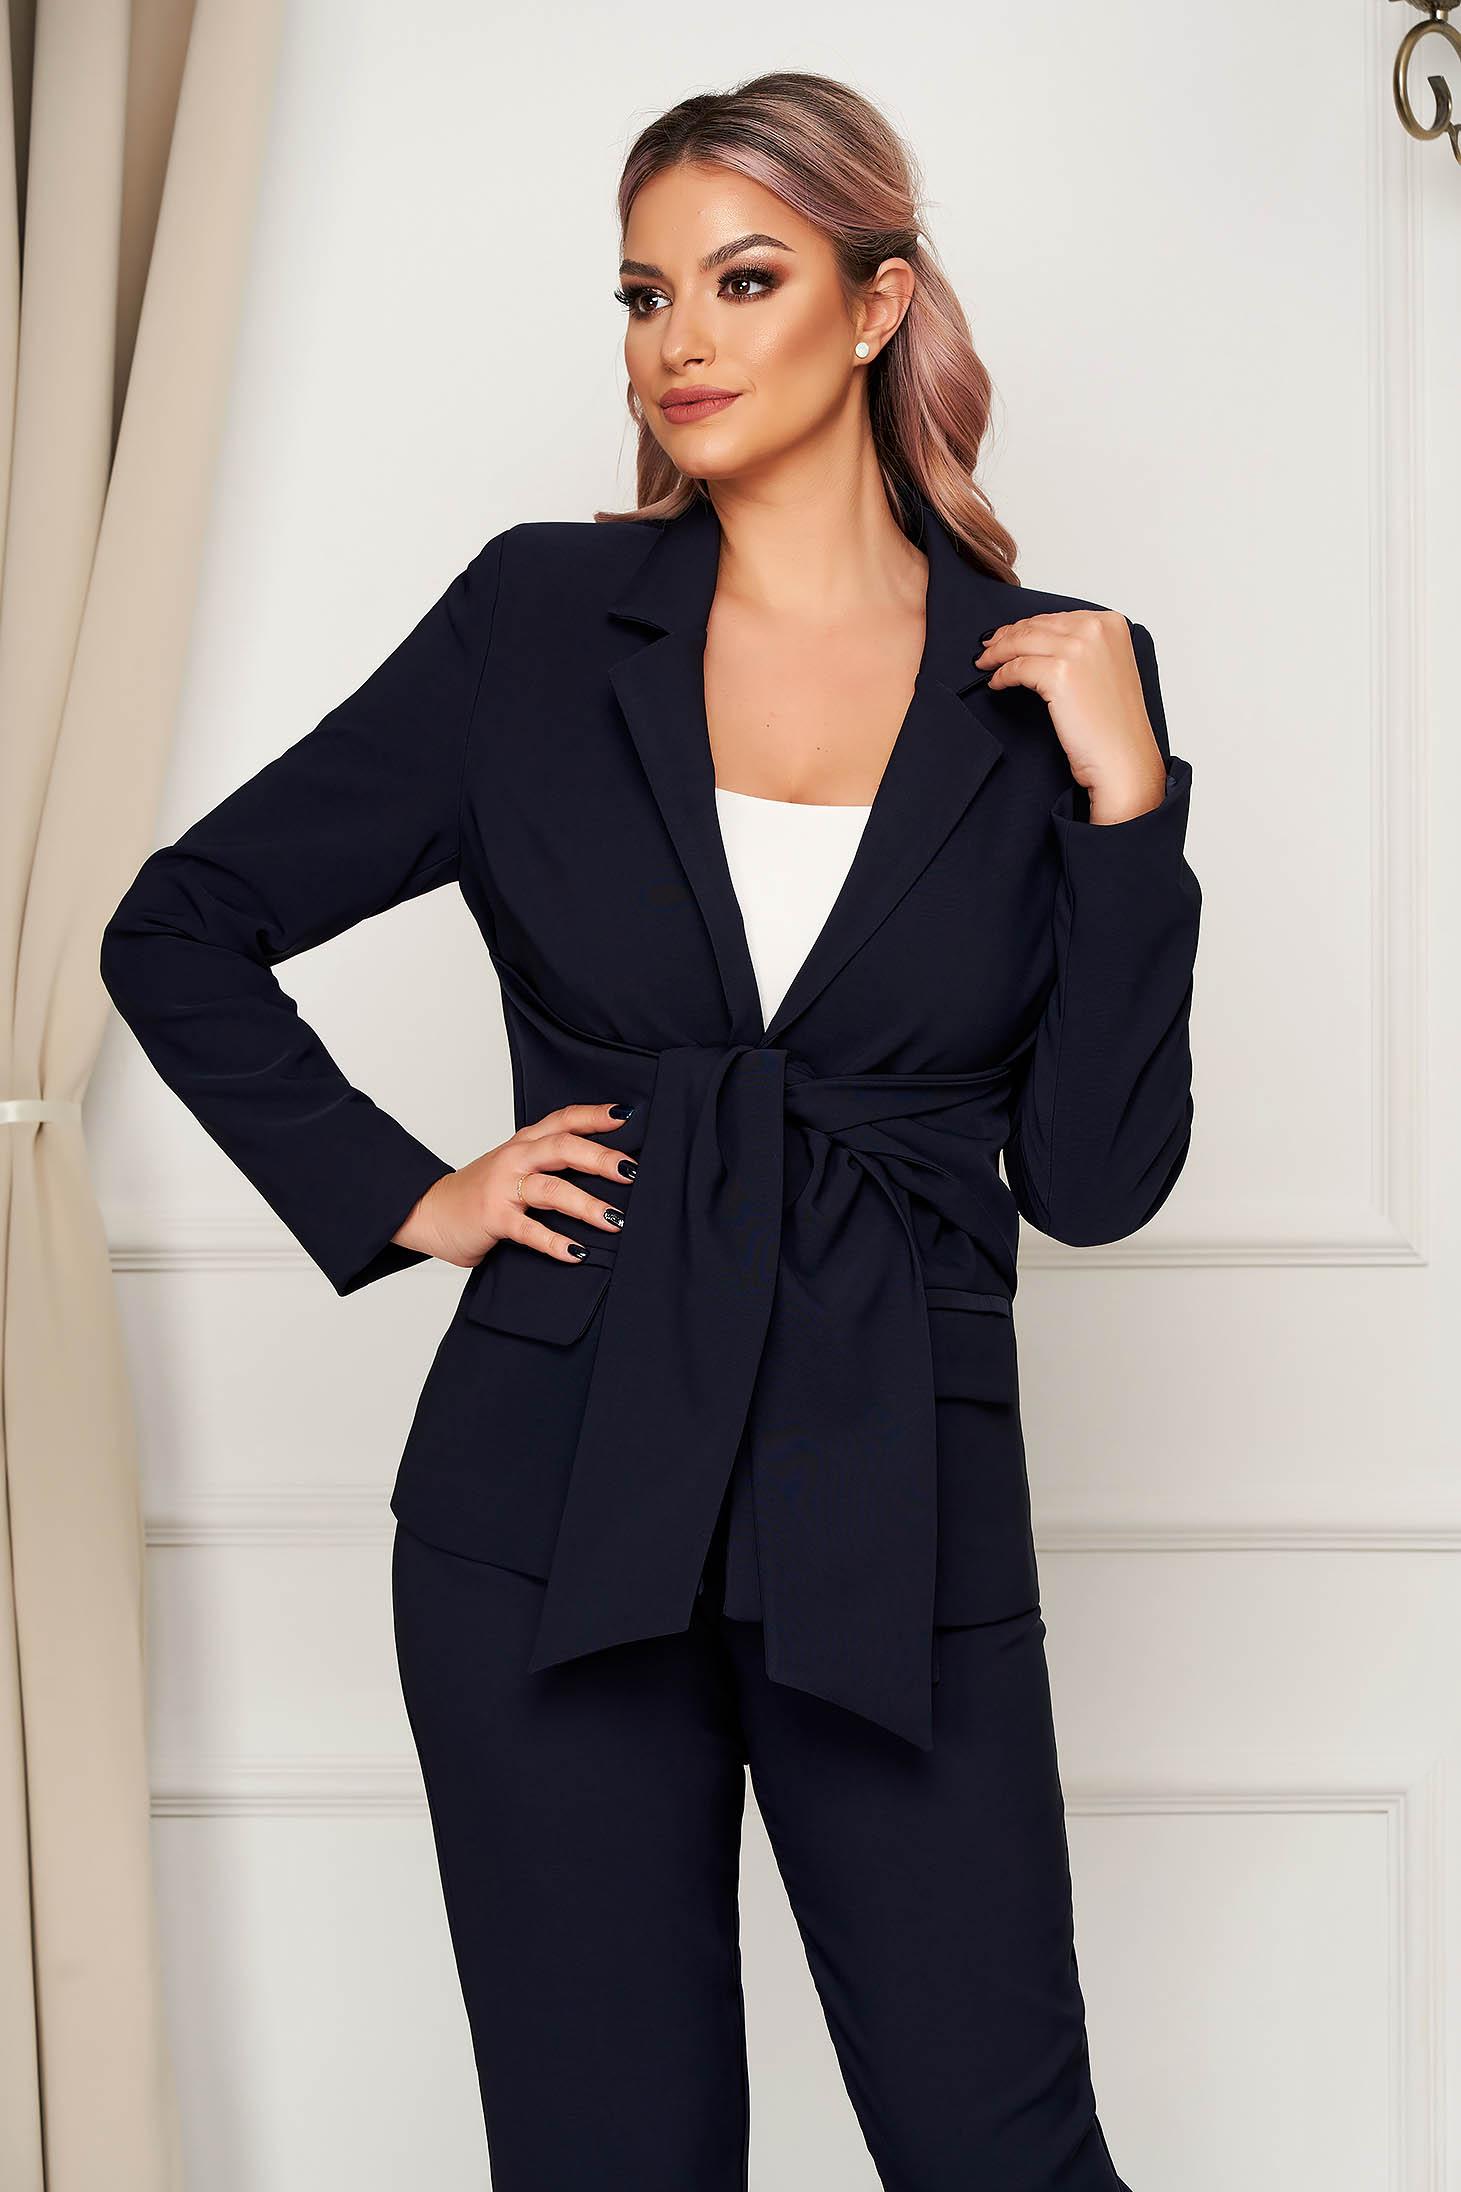 Darkblue jacket office straight slightly elastic fabric